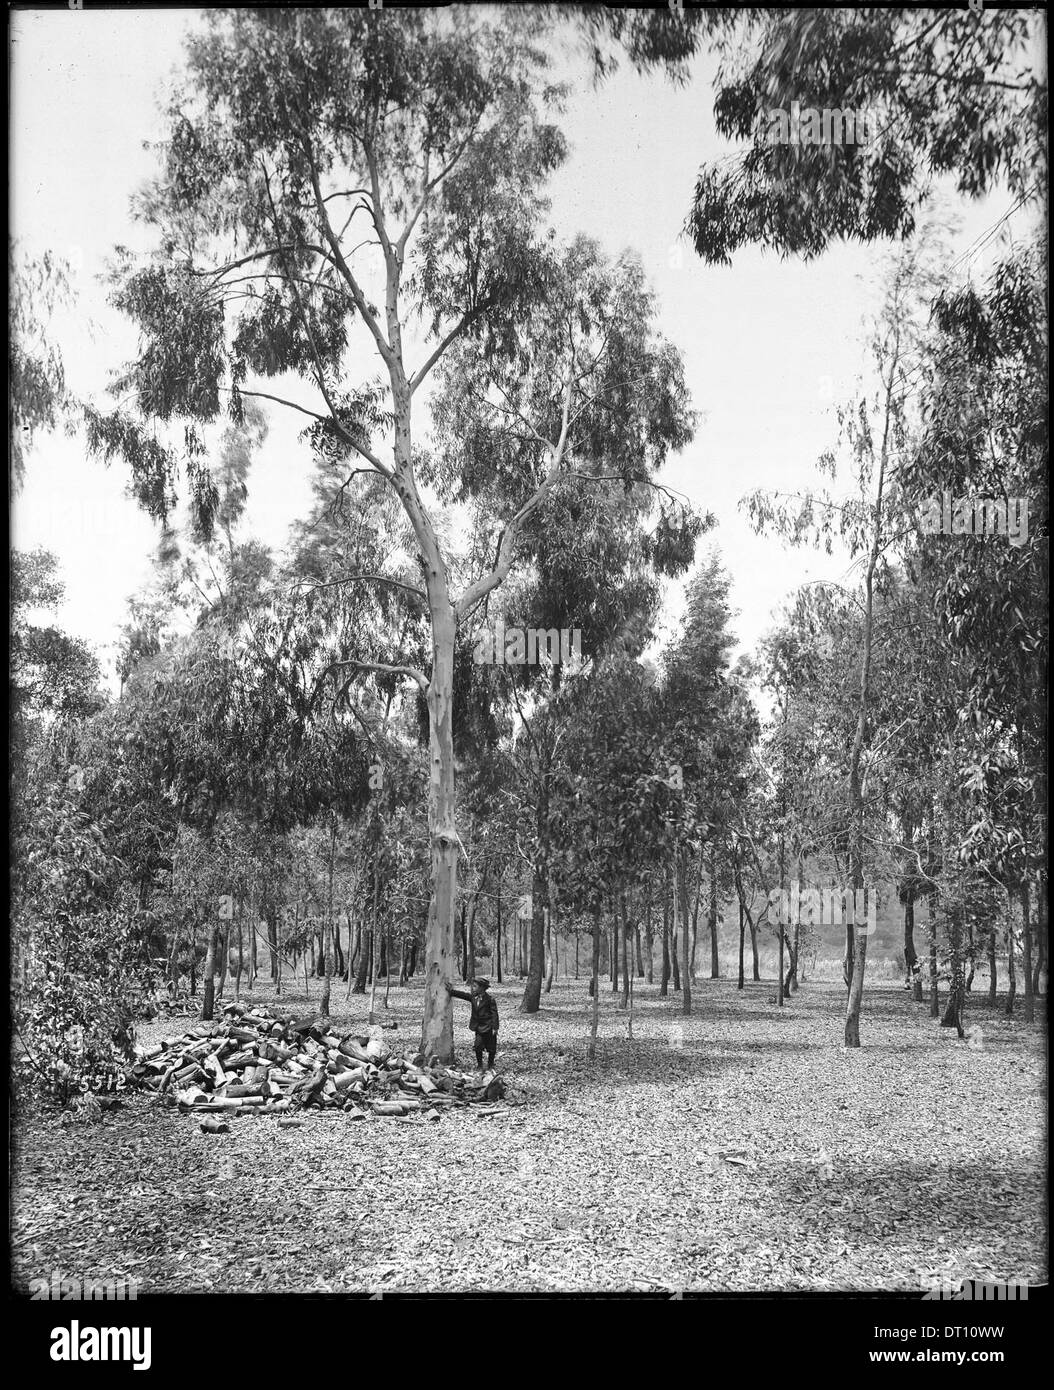 Eucalyptus trees, ca.1900 - Stock Image